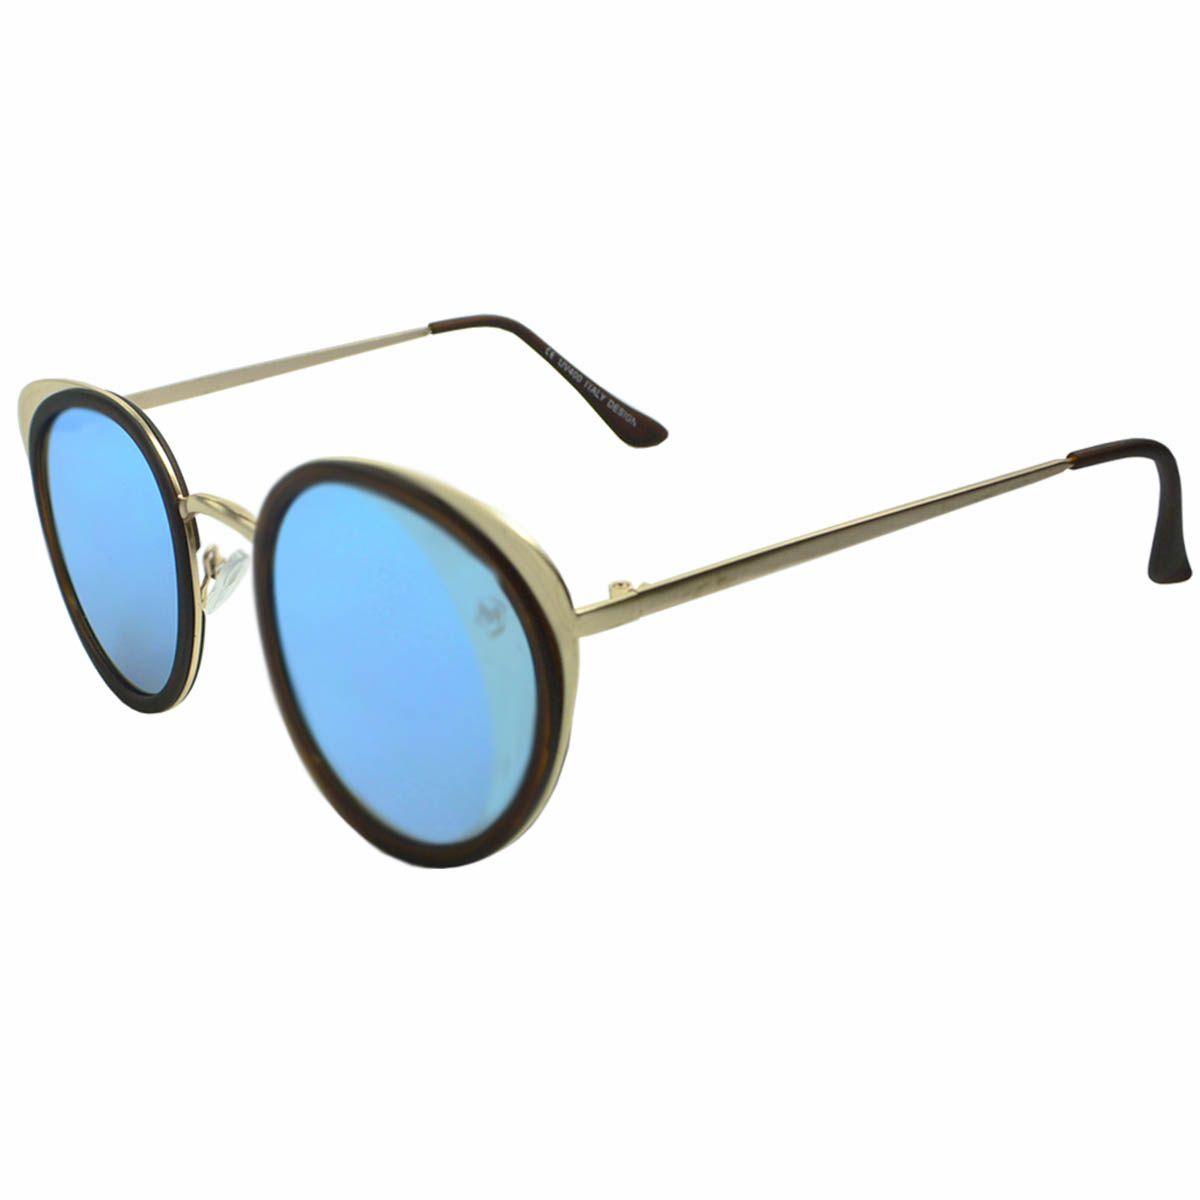 340854dc33b96 Óculos de Sol Feminino Mackage MK01473V - Mackage ...